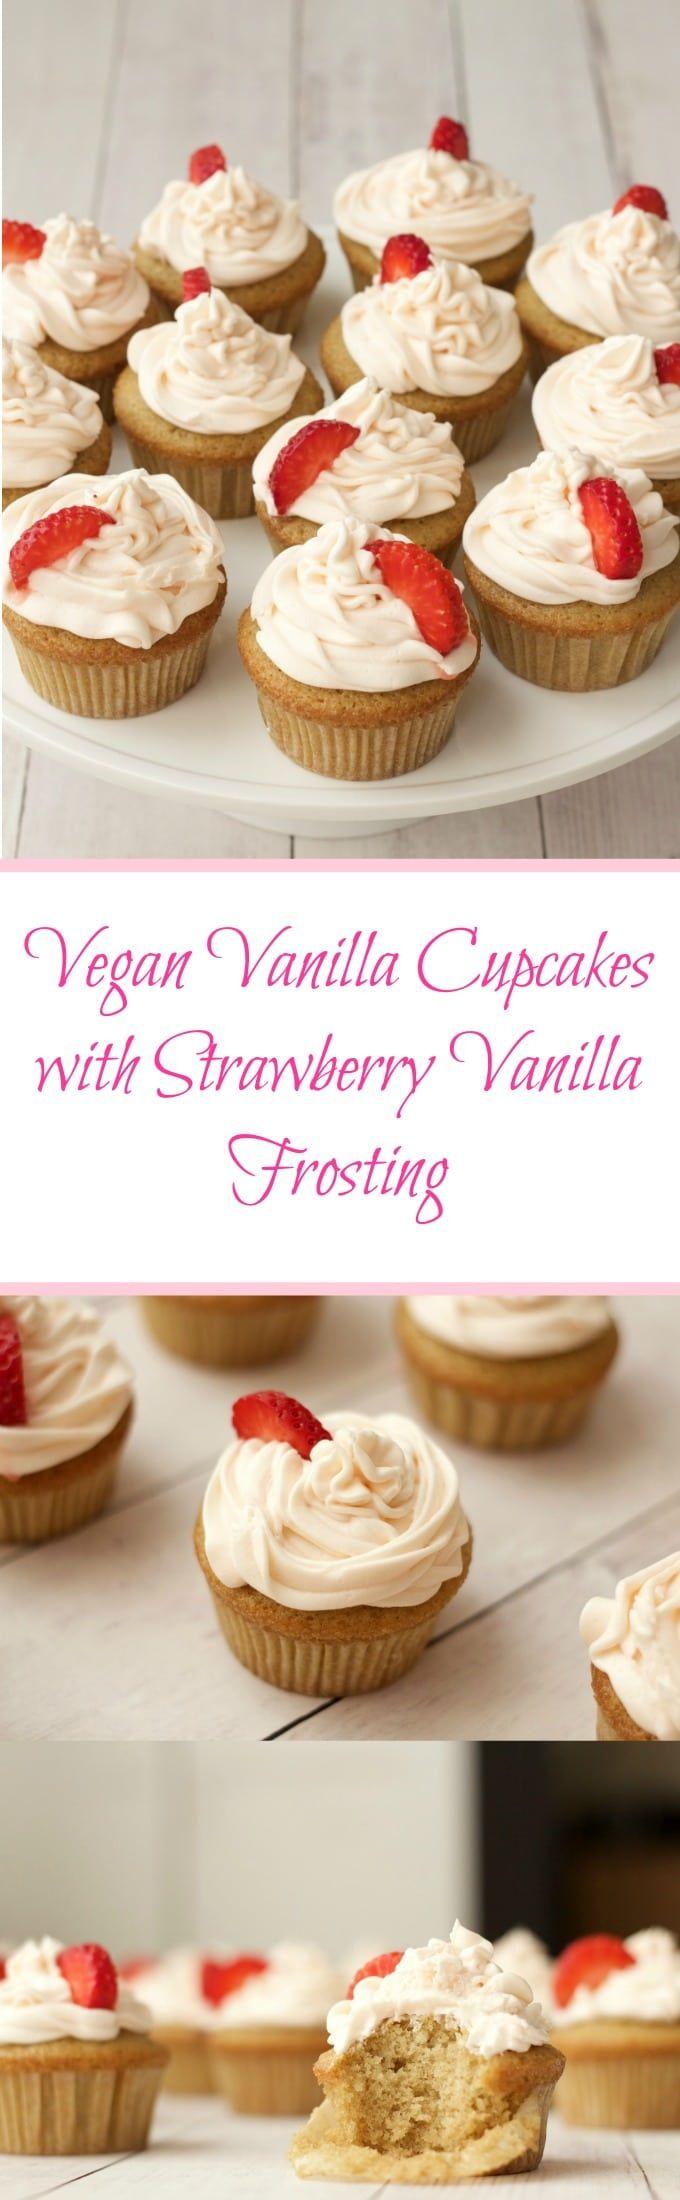 Vegan Vanilla Cupcakes With Strawberry Vanilla Frosting Vegan Lovingitvegan Vanilla Cupcakes De Vegan Vanilla Cupcakes Easy Vanilla Cupcakes Clean Dessert